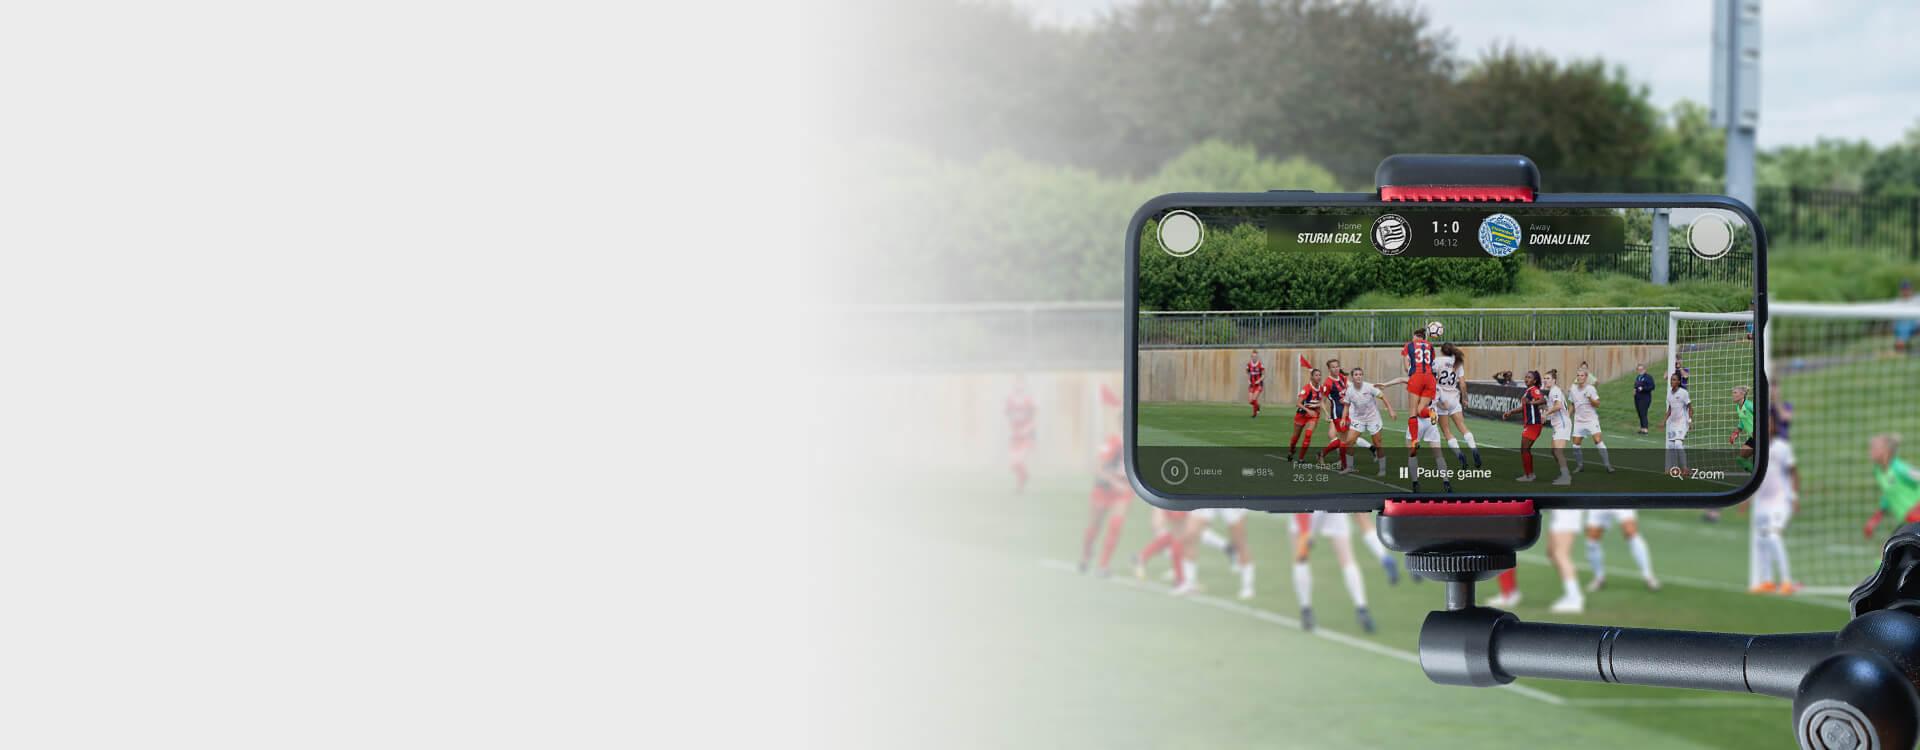 SV-camera_on_tripod